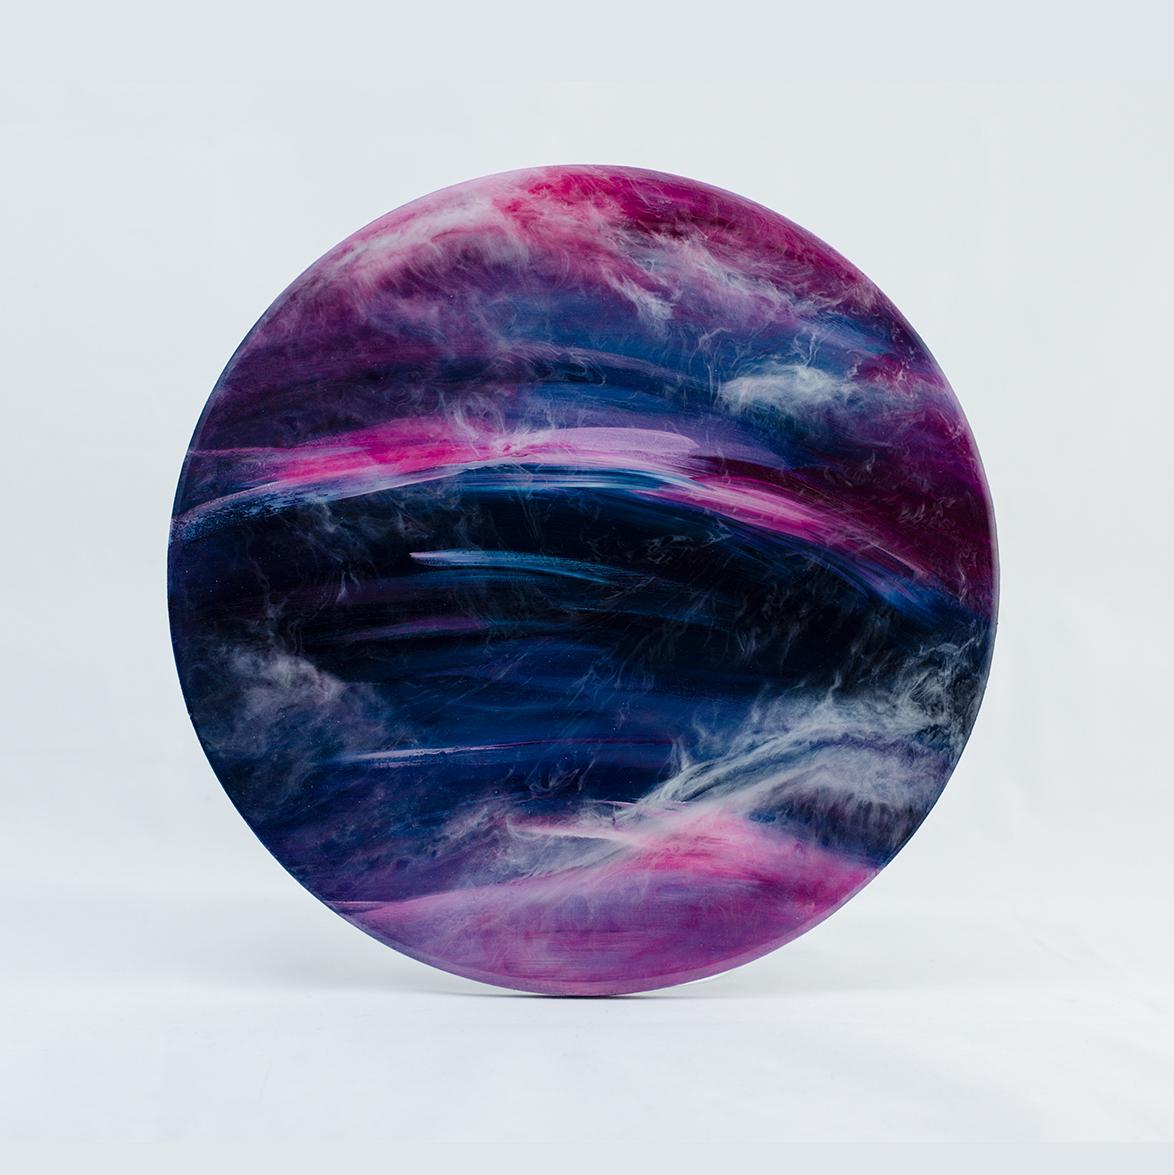 Commissioned artwork: Purple Dreams